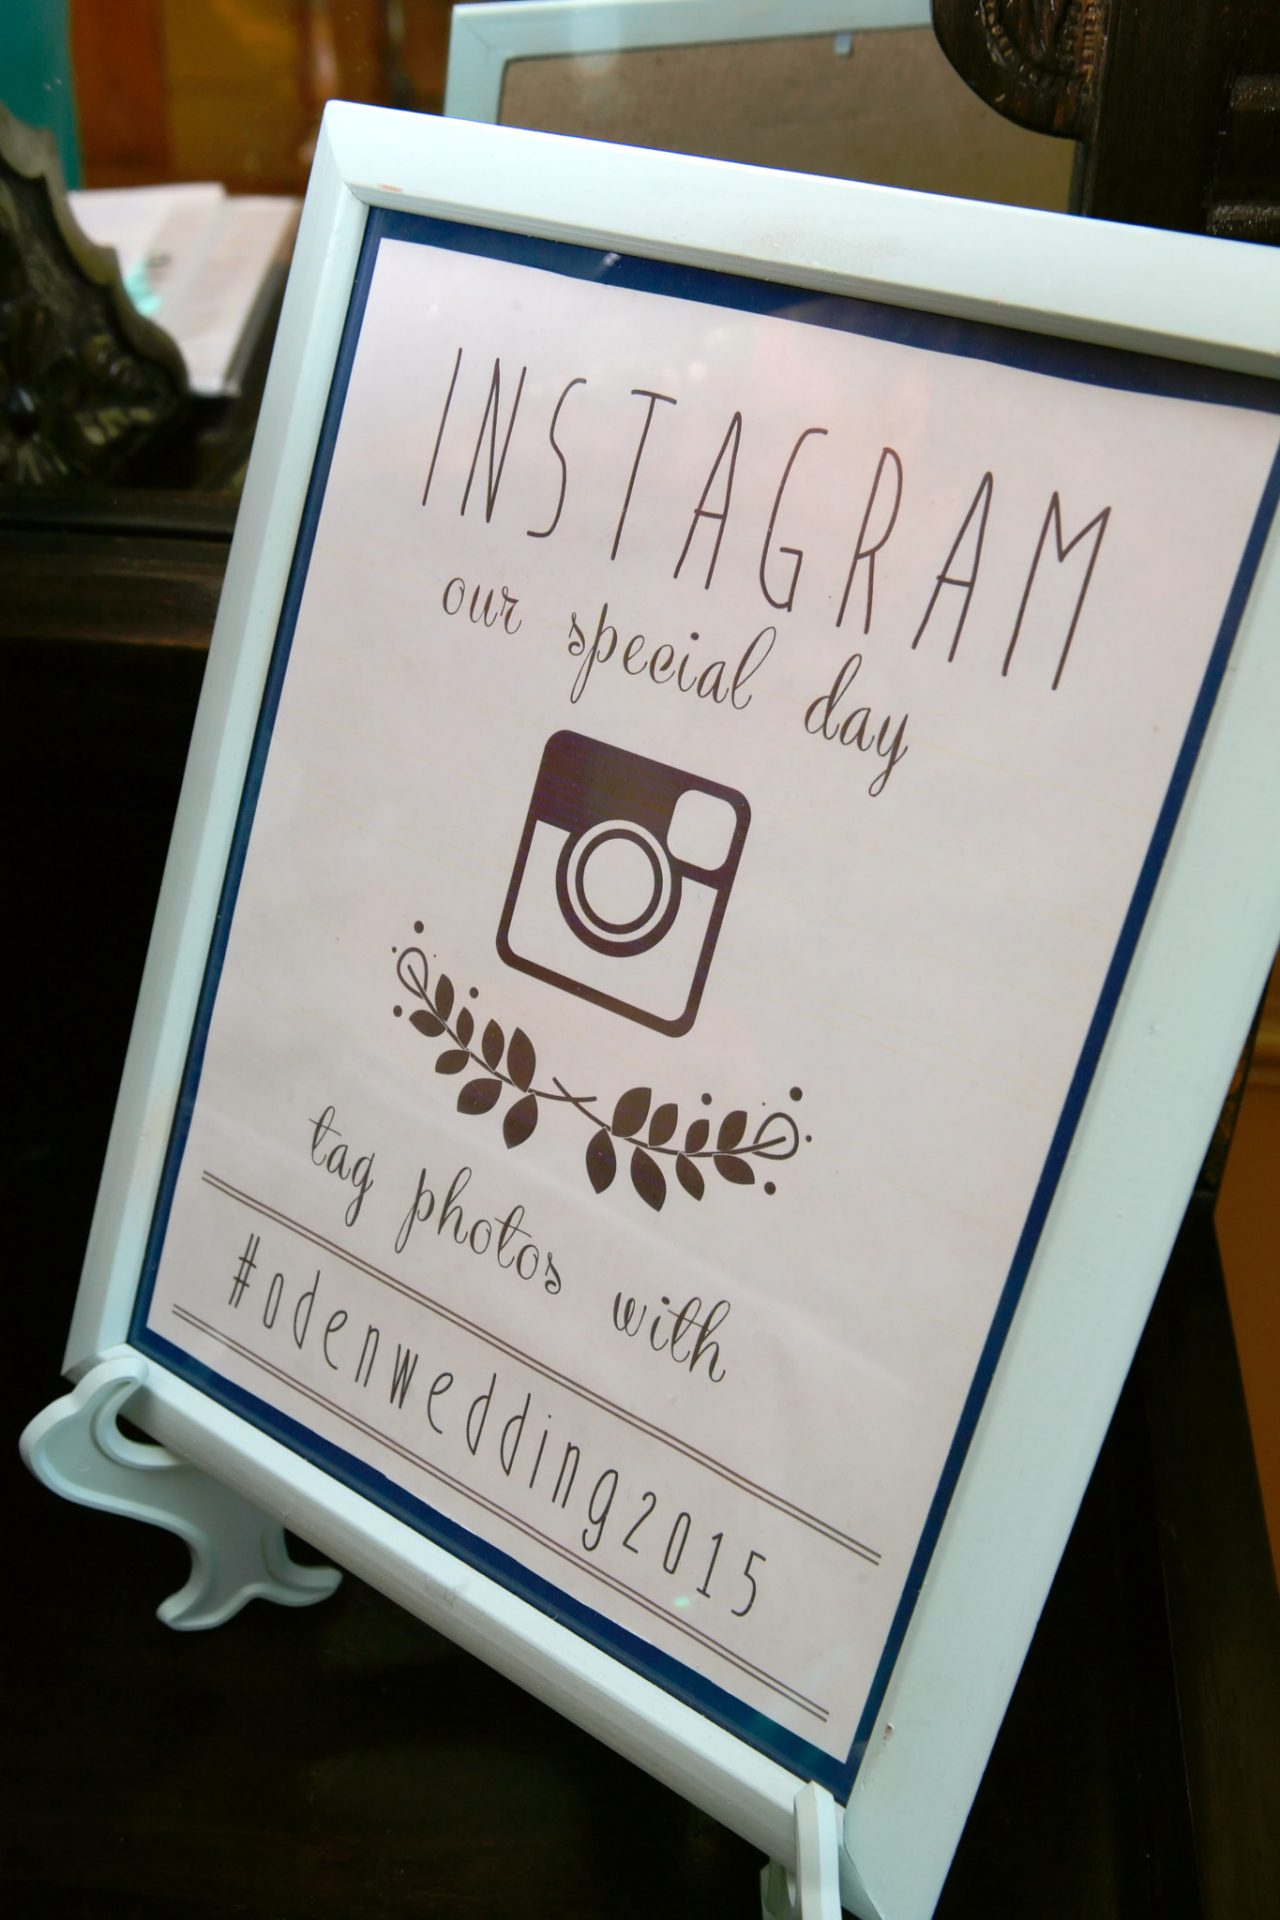 Instagram information for bride and groom